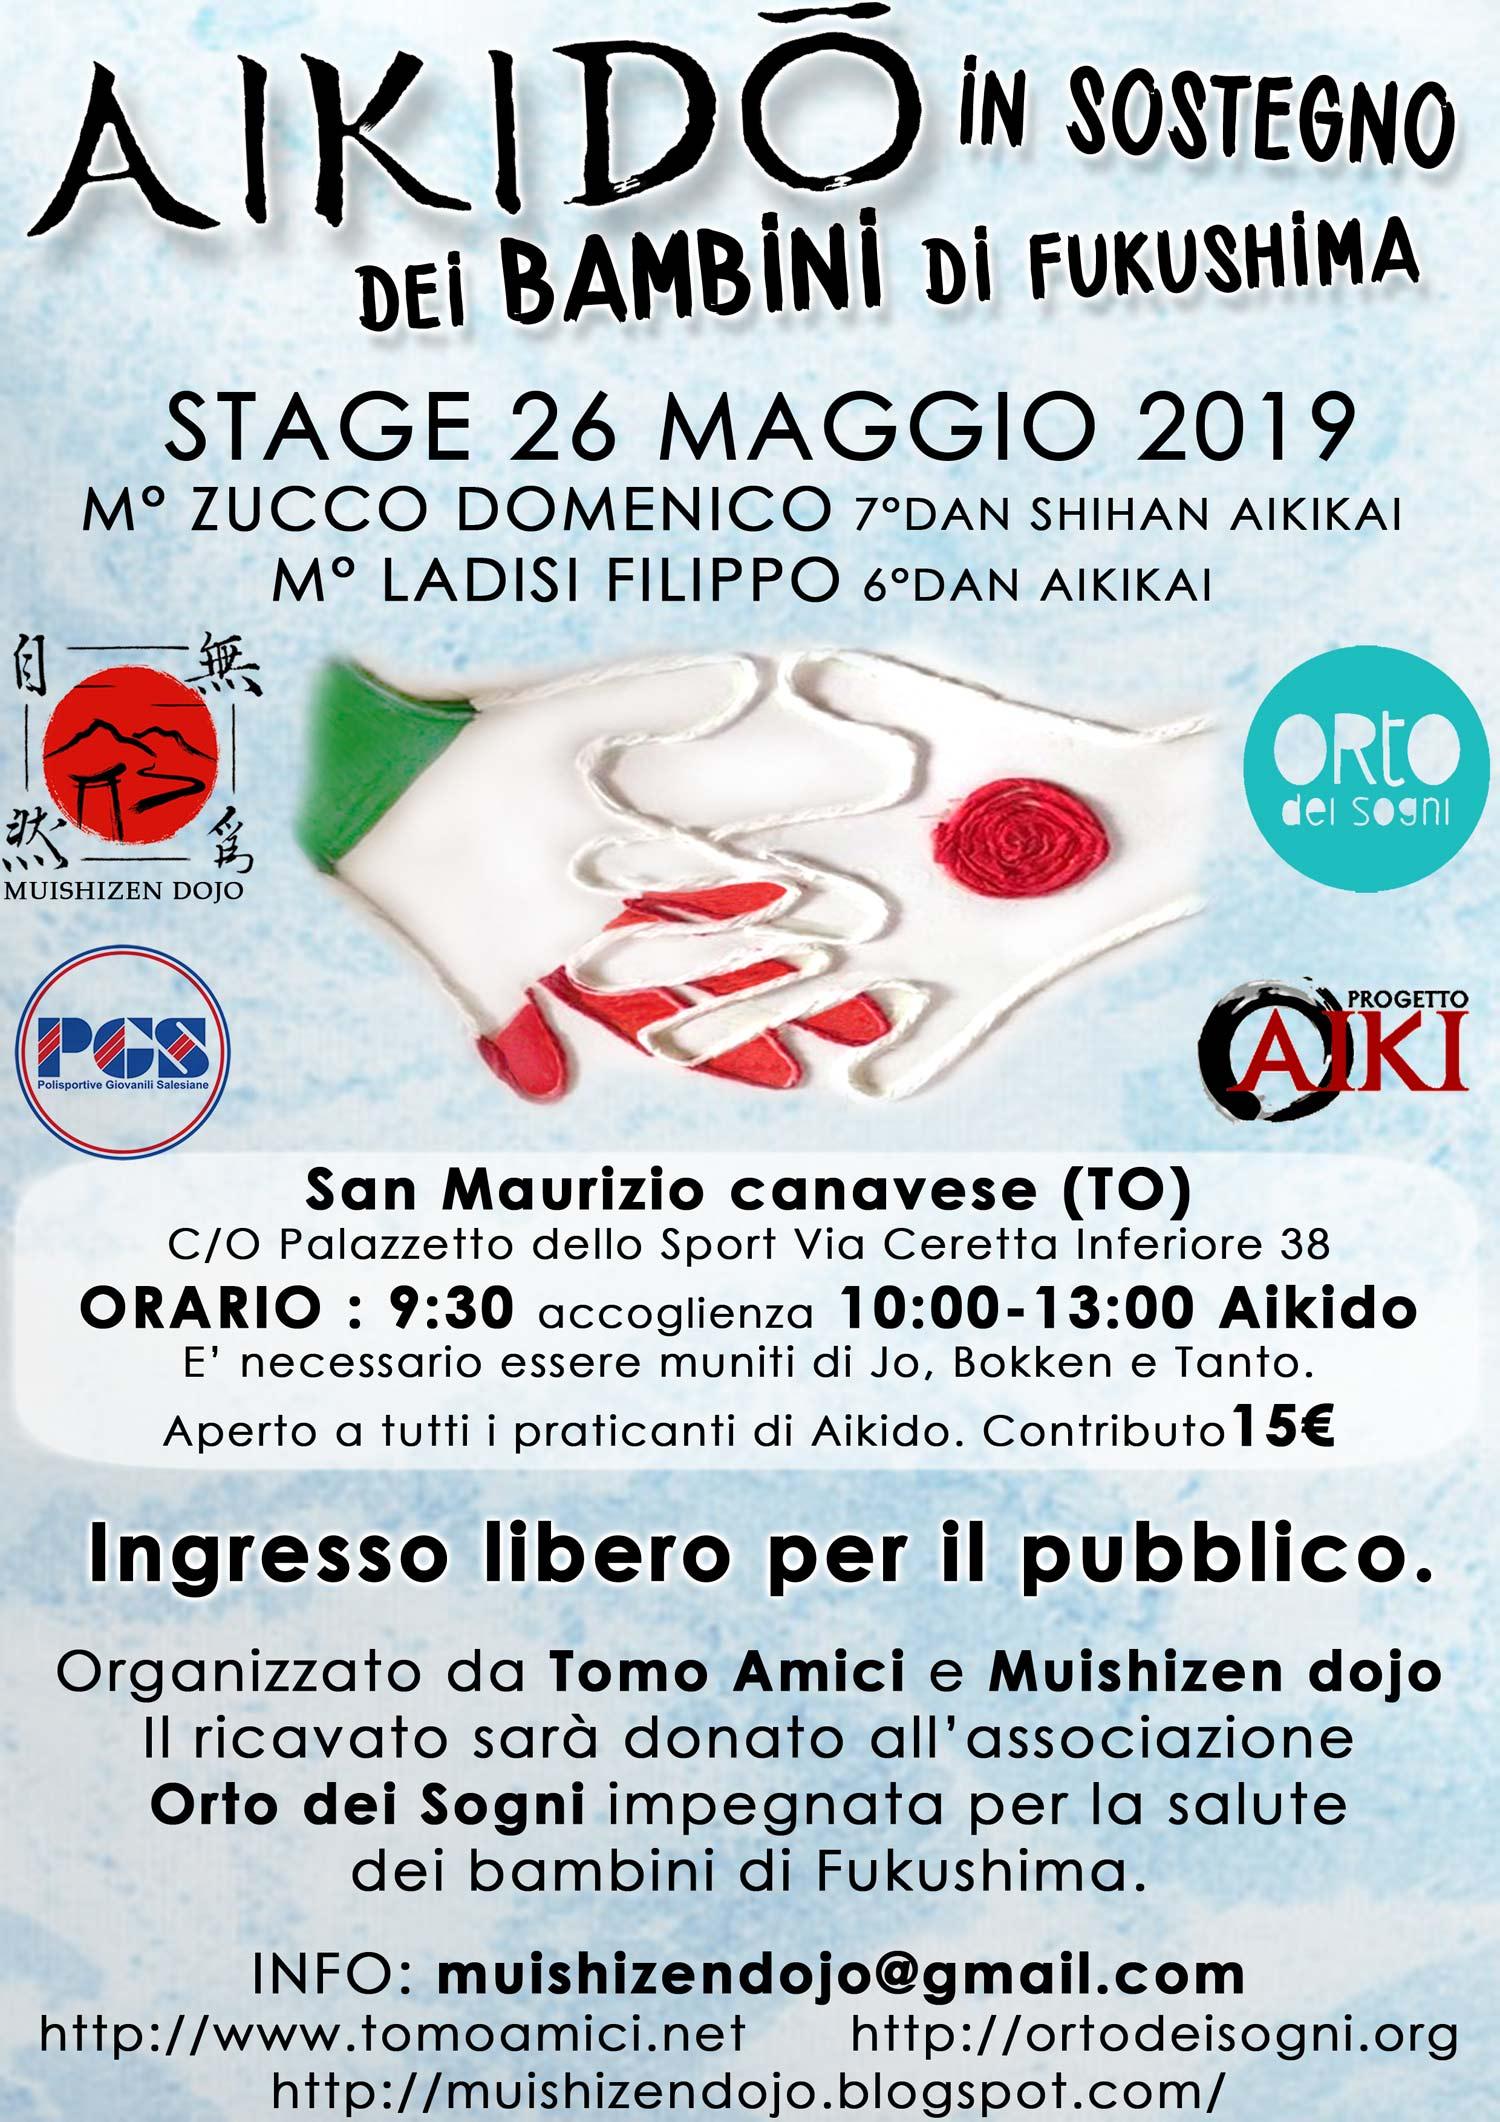 Stage di Aikido, Aikido in sotegno dei bambini di Fukushima, Muishizen APS, San Maurizio canavese